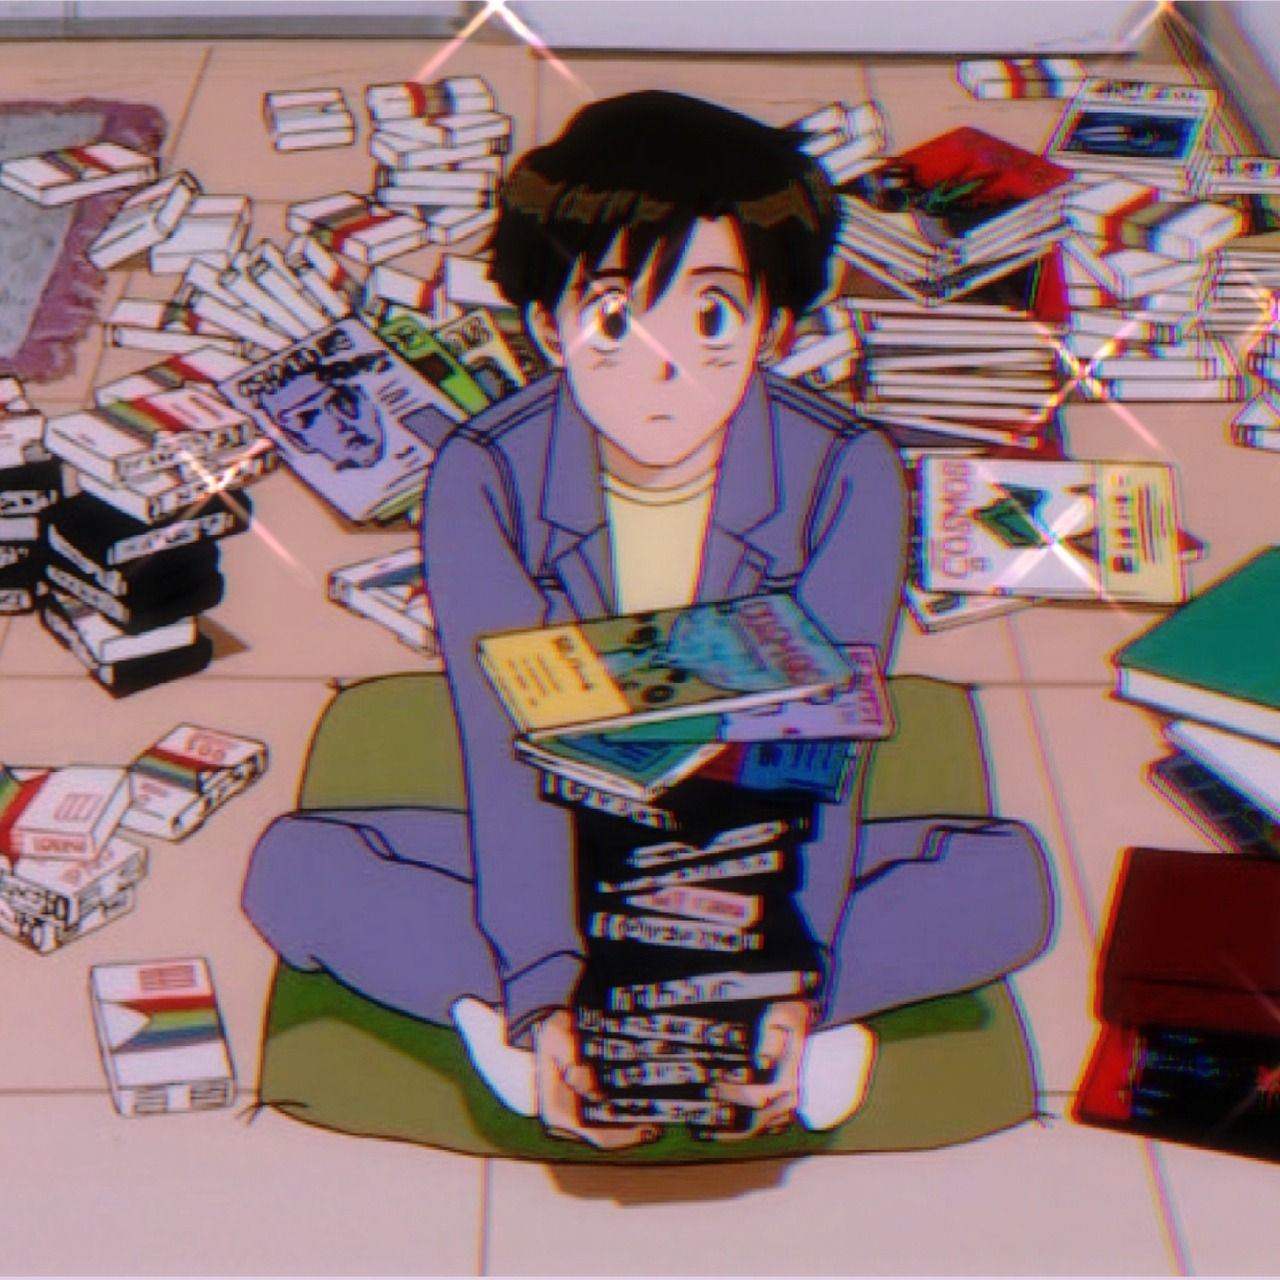 90s anime aesthetic Aesthetic anime, 90s anime, Cute